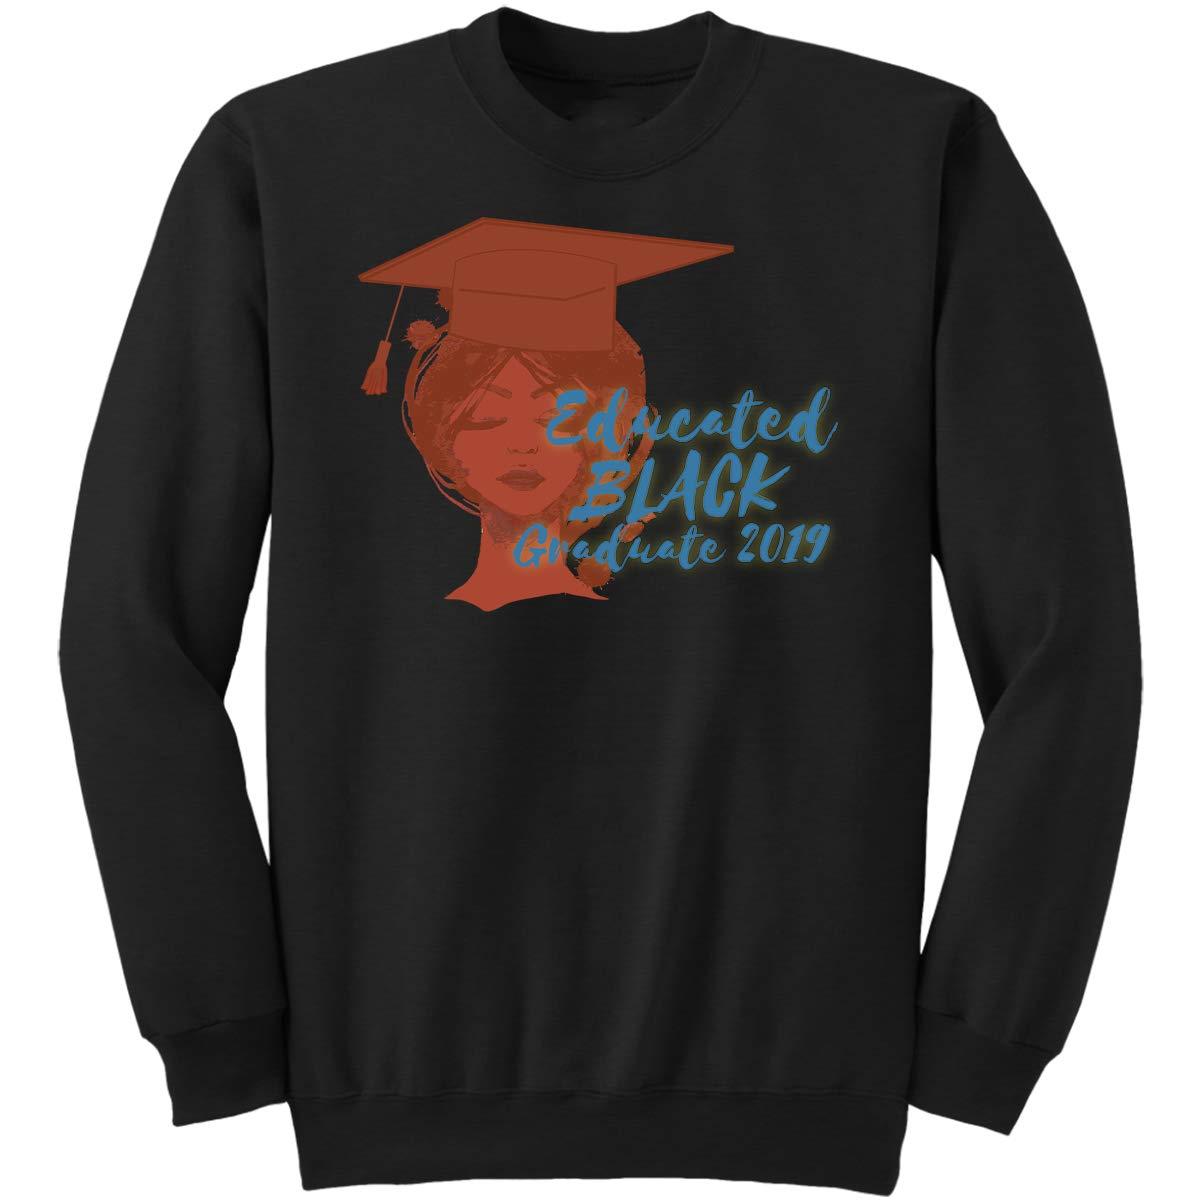 Gifts Fo Sweatshirt Educated Black Graduate 2019